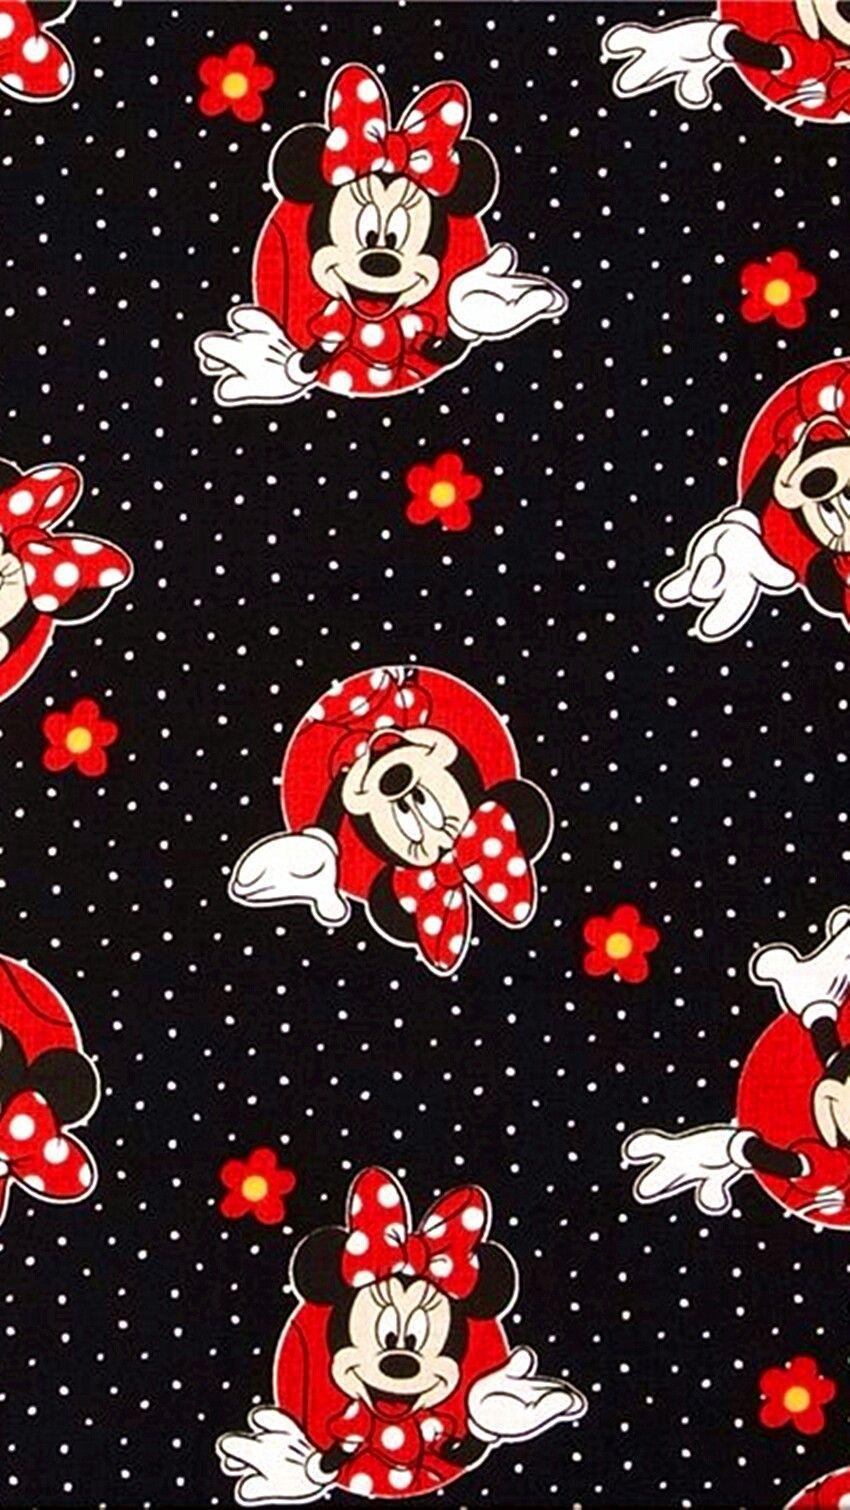 Minnie mouse disney pinterest fondos pantalla y for Protector de pantalla disney